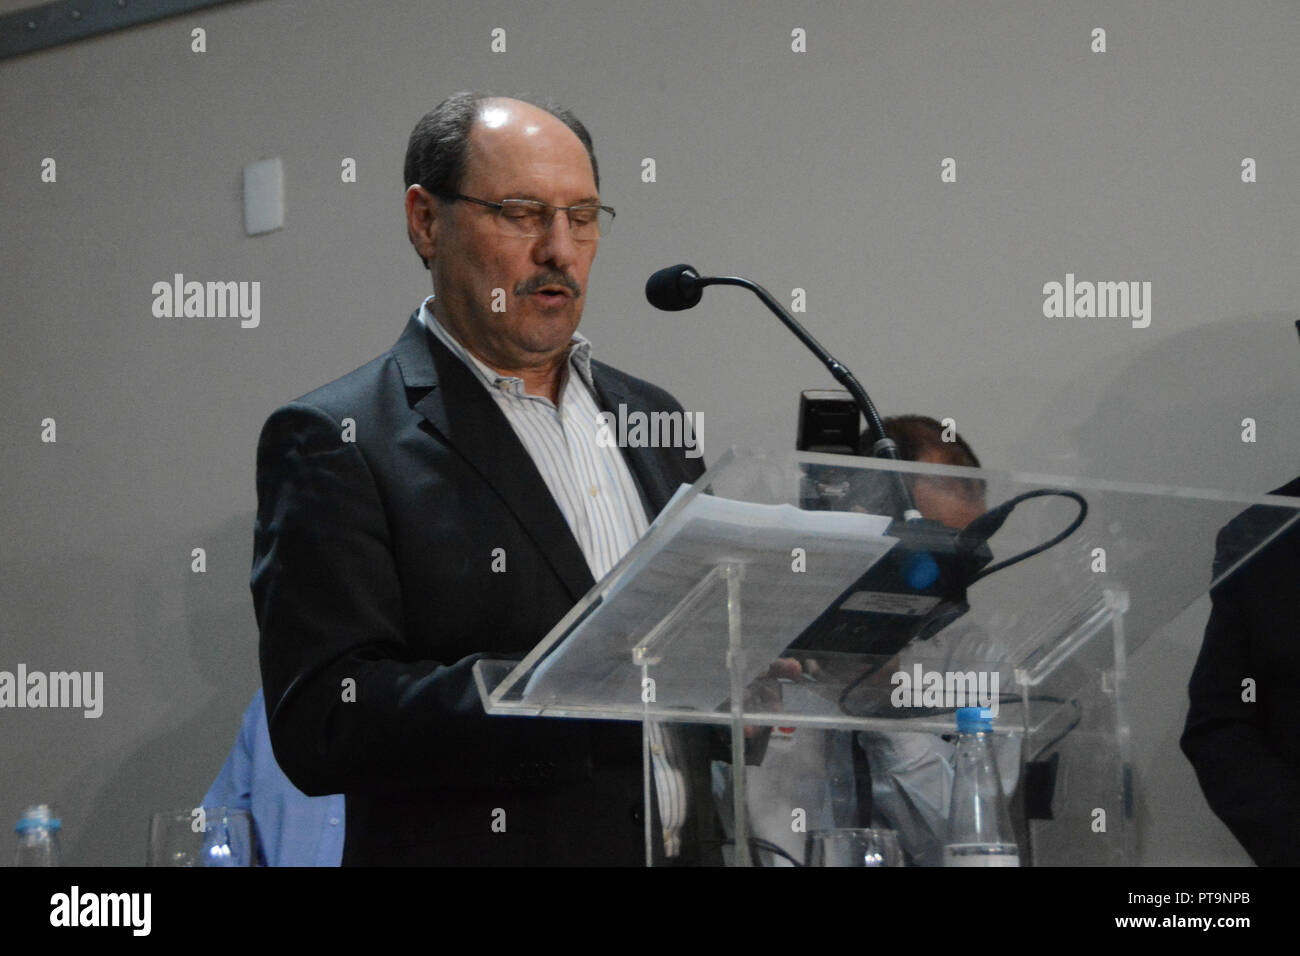 PORTO ALEGRE, RS - 07 10 2018: ELECTIONS 2018 RS - Press conference